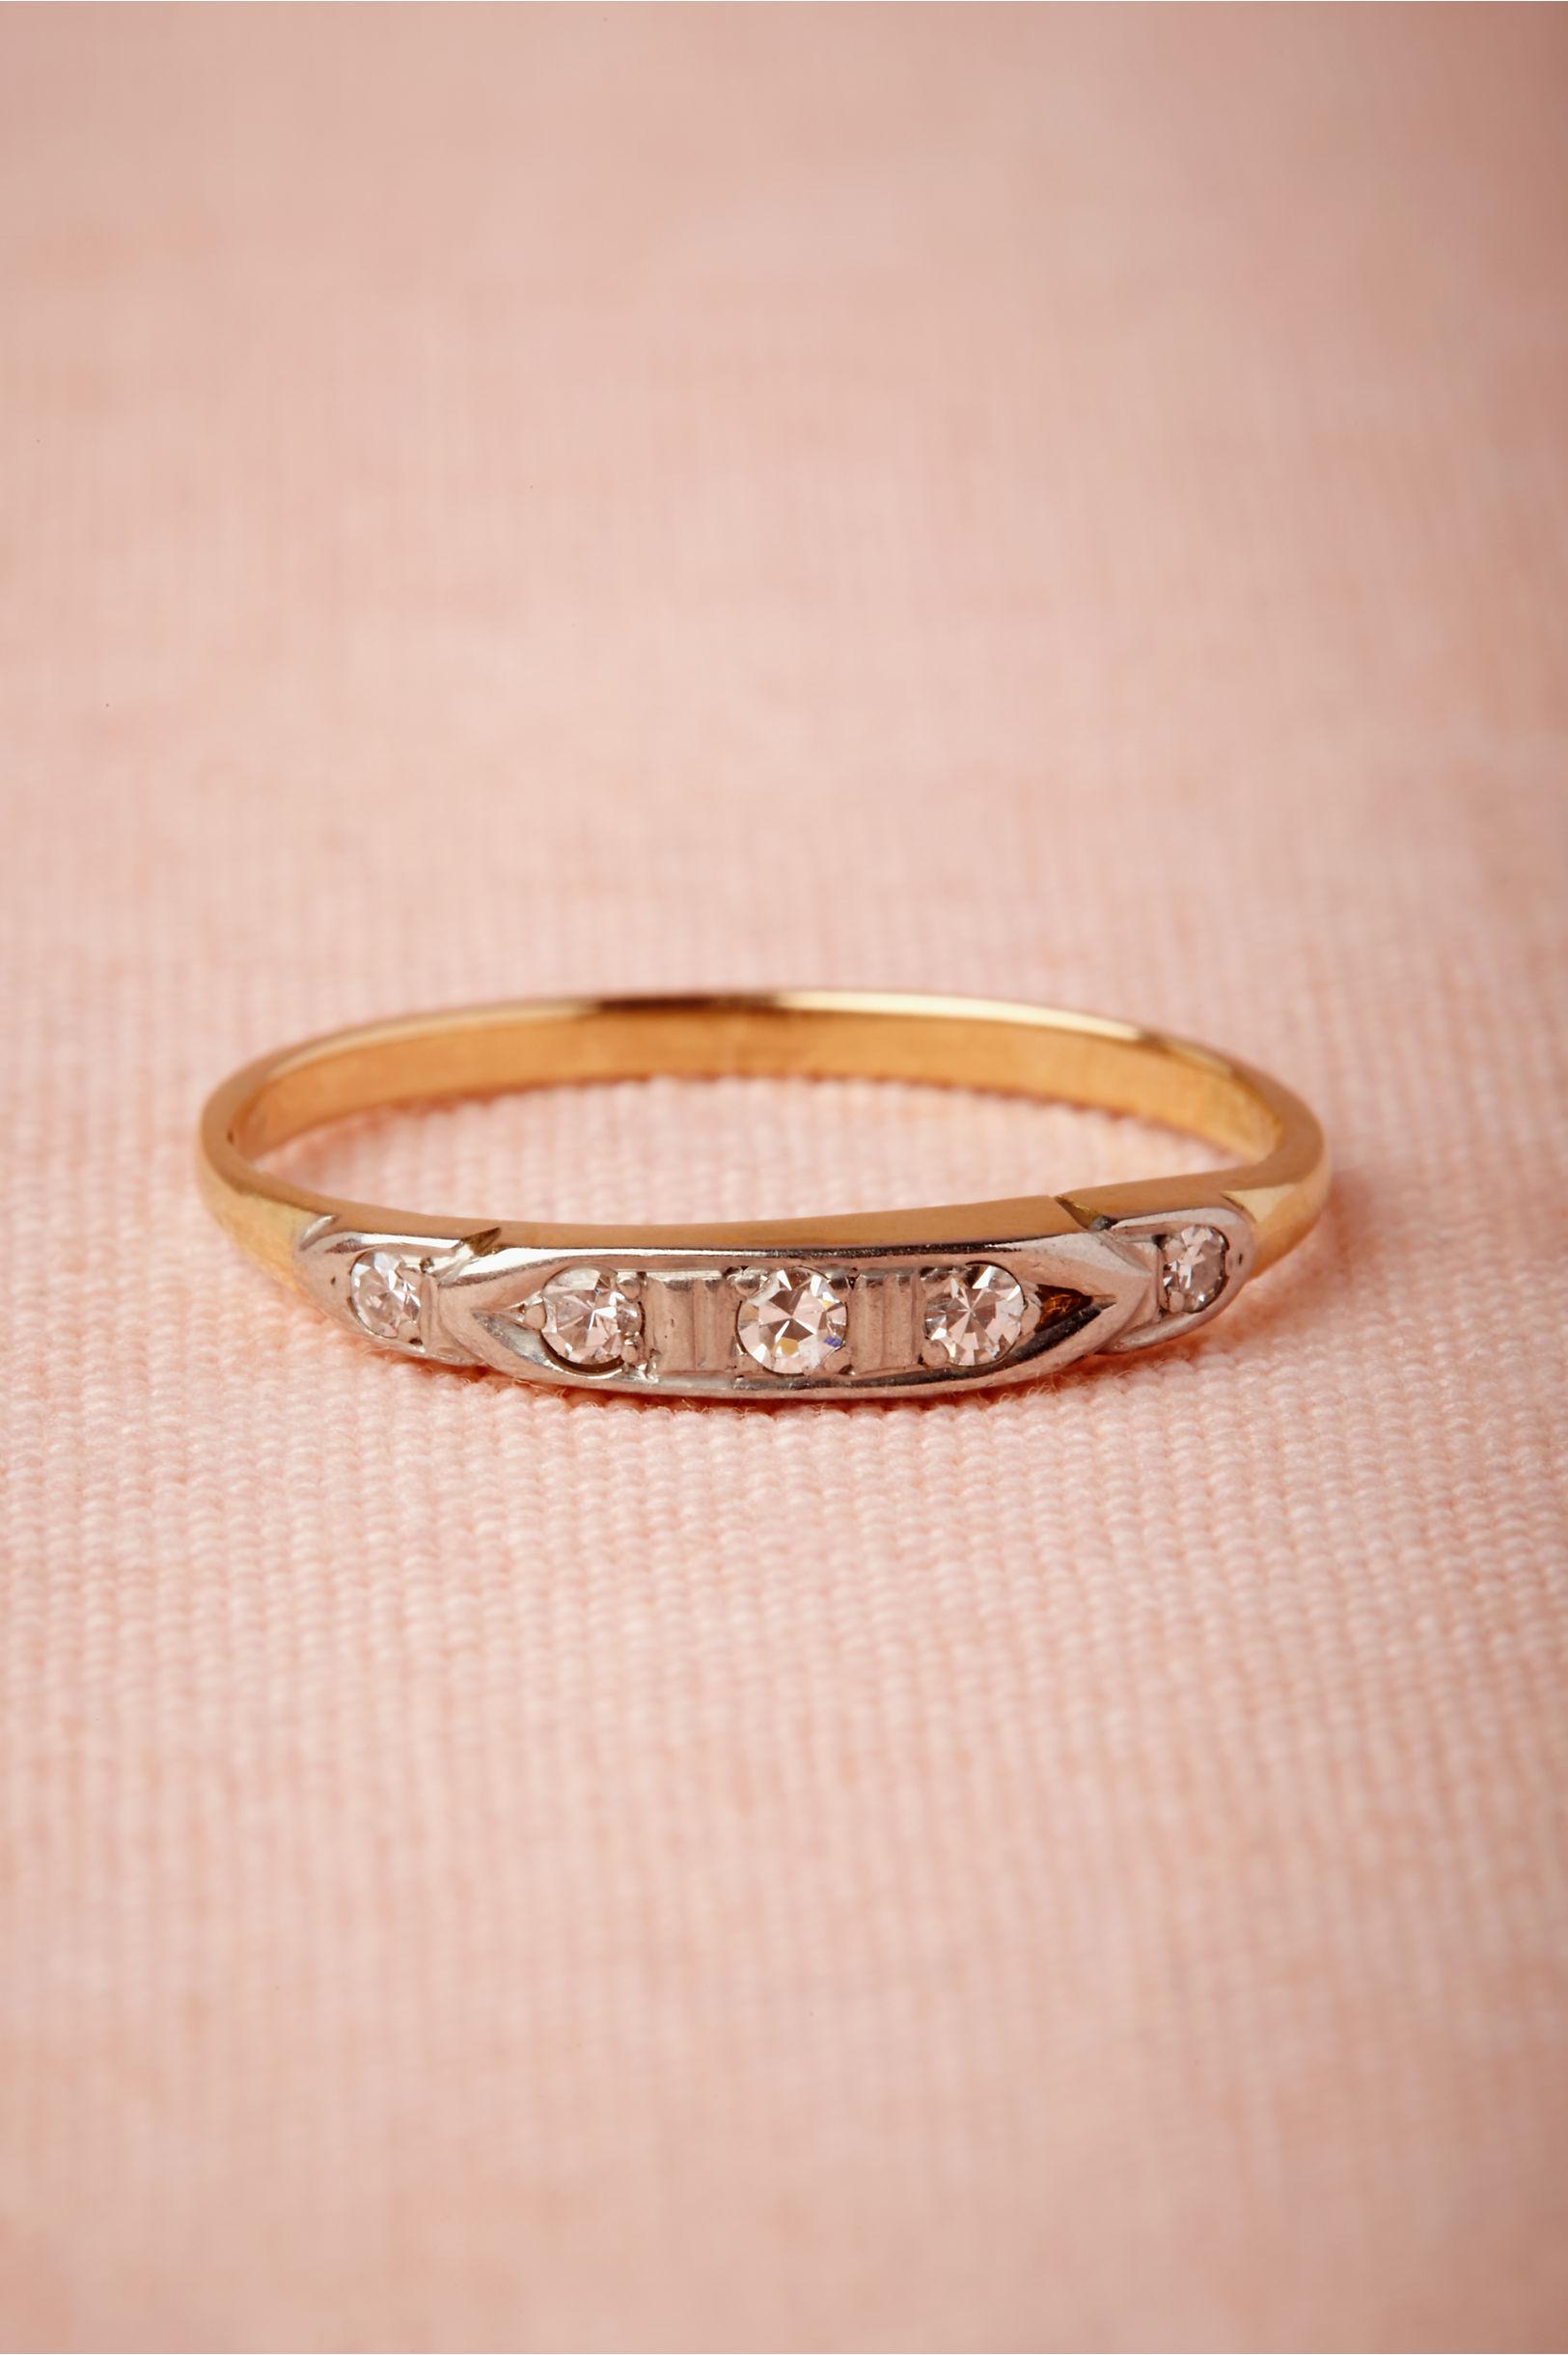 Cassandre Ring in Bride | BHLDN